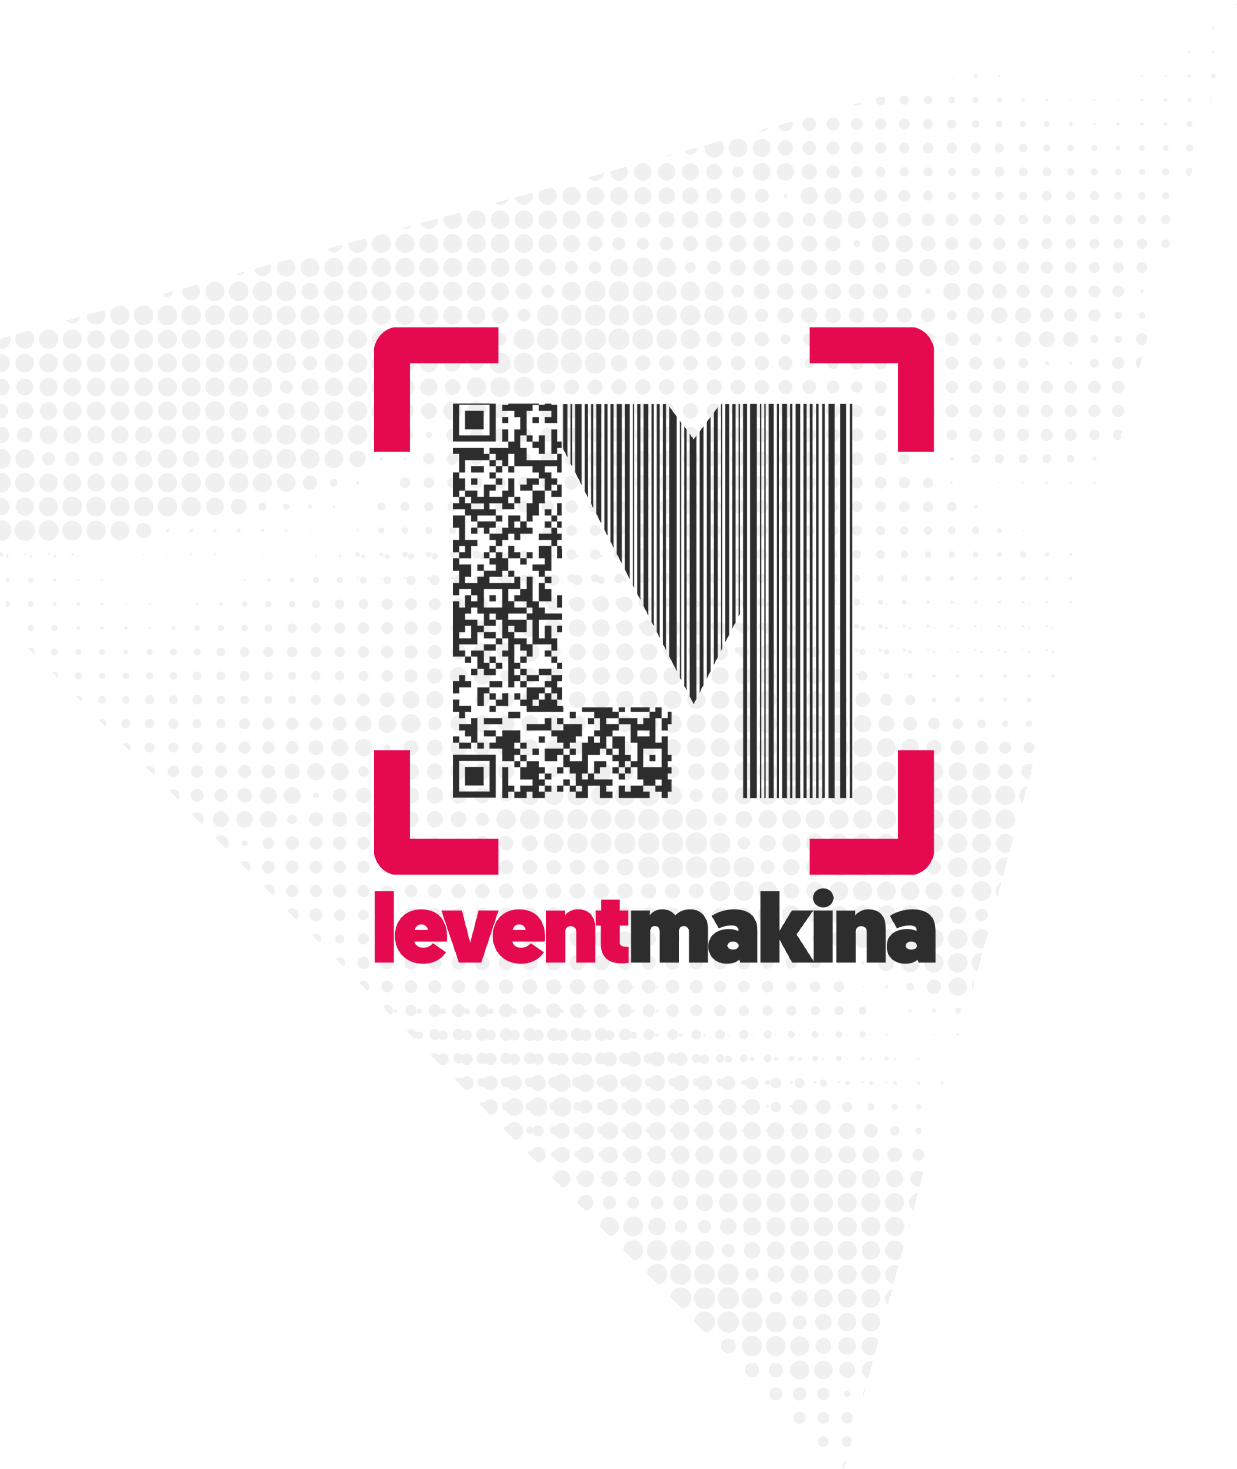 https://leventmakina.com.tr/wp-content/uploads/2019/11/logo-1.png